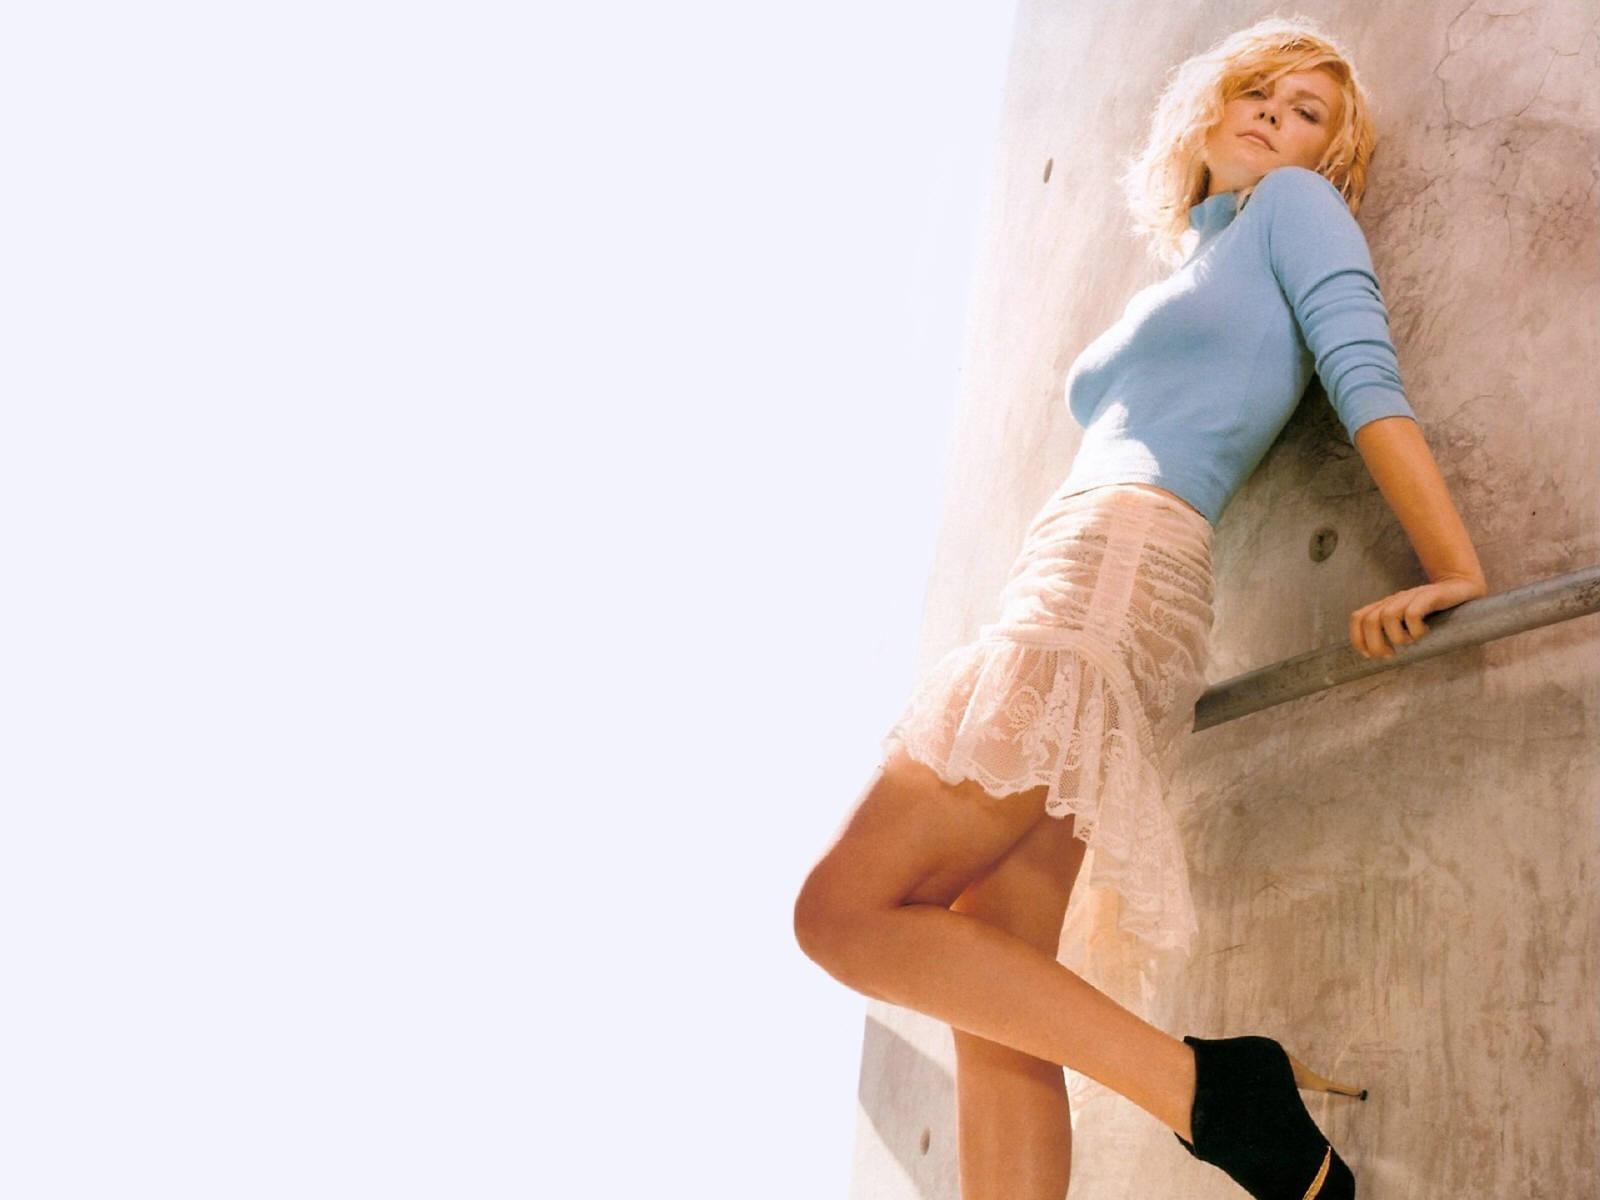 Wallpaper di Kirsten Dunst in posa sexy